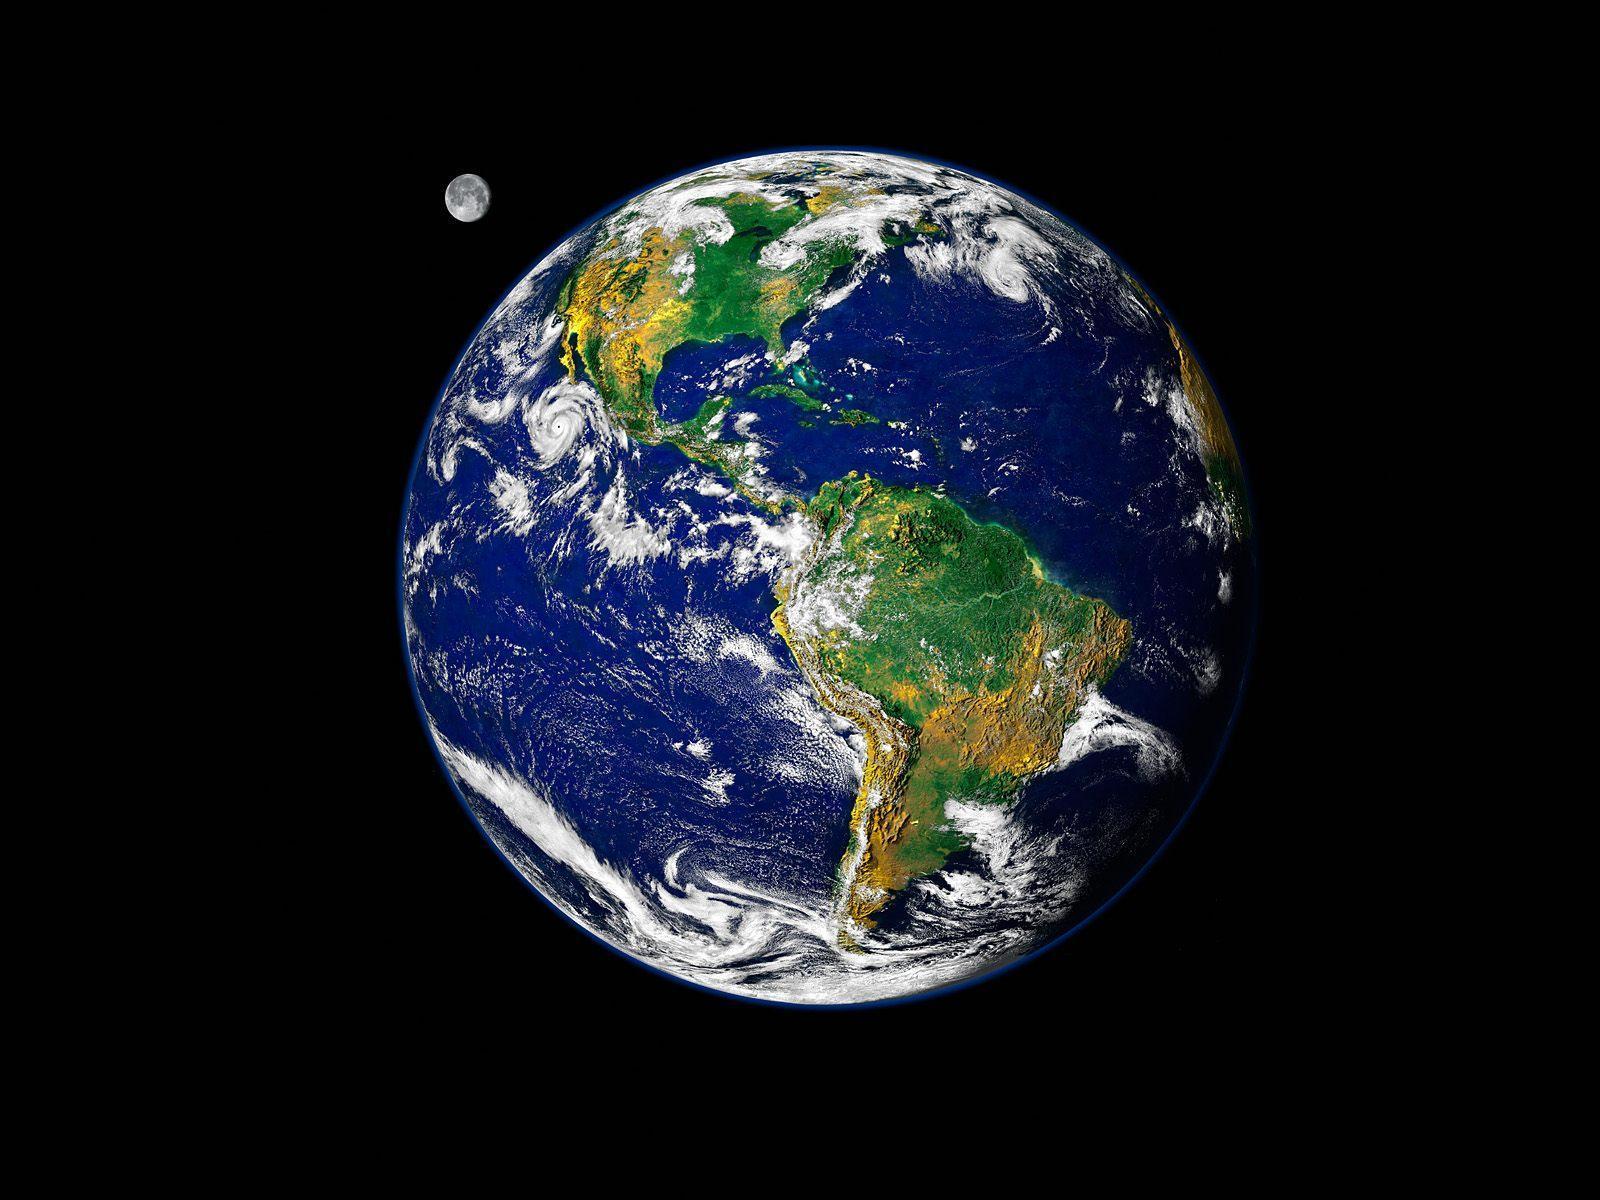 1600x1200 خلفية الأرض 08 - [1600 × 1200]